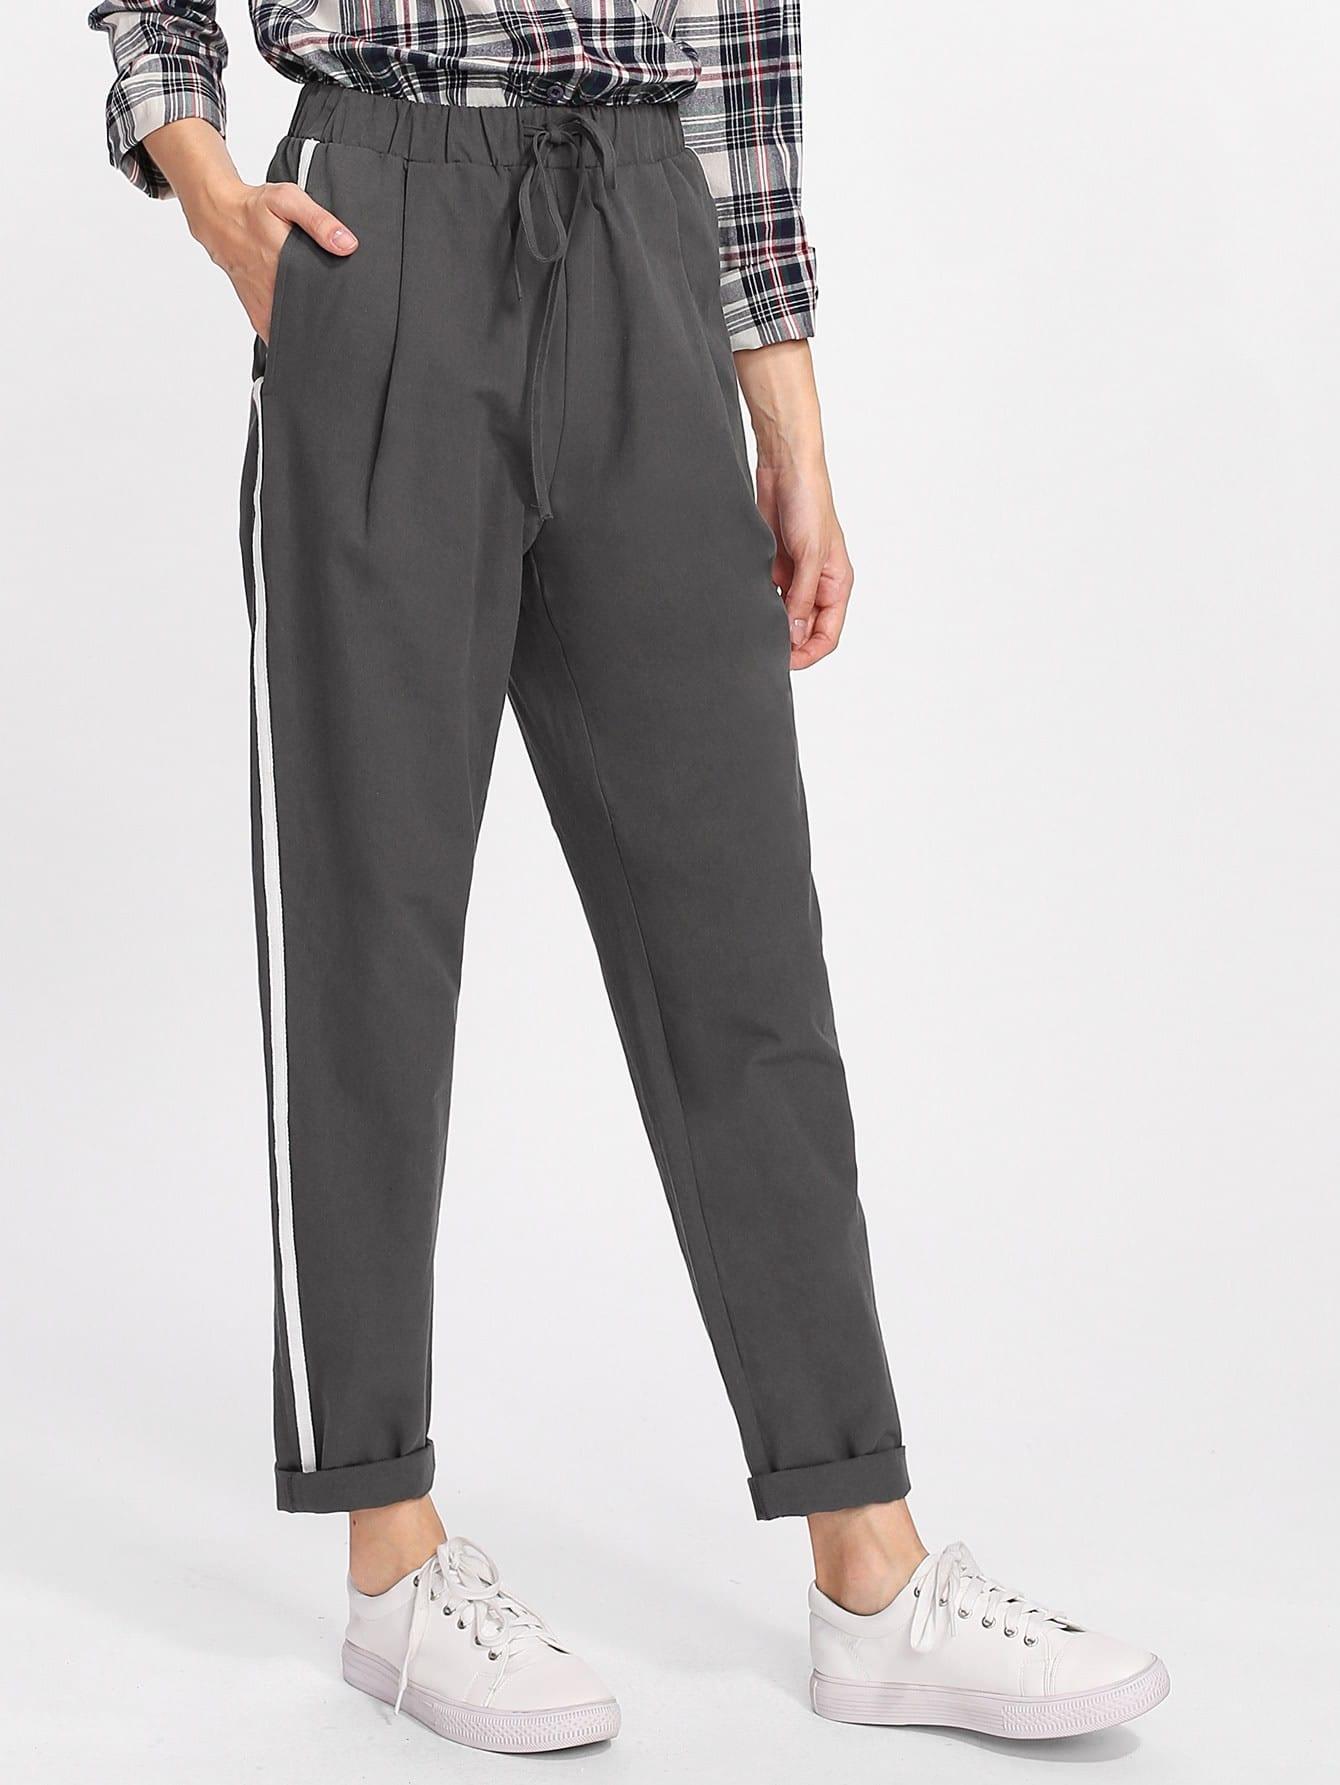 Image of Drawstring Waist Striped Side Peg Pants